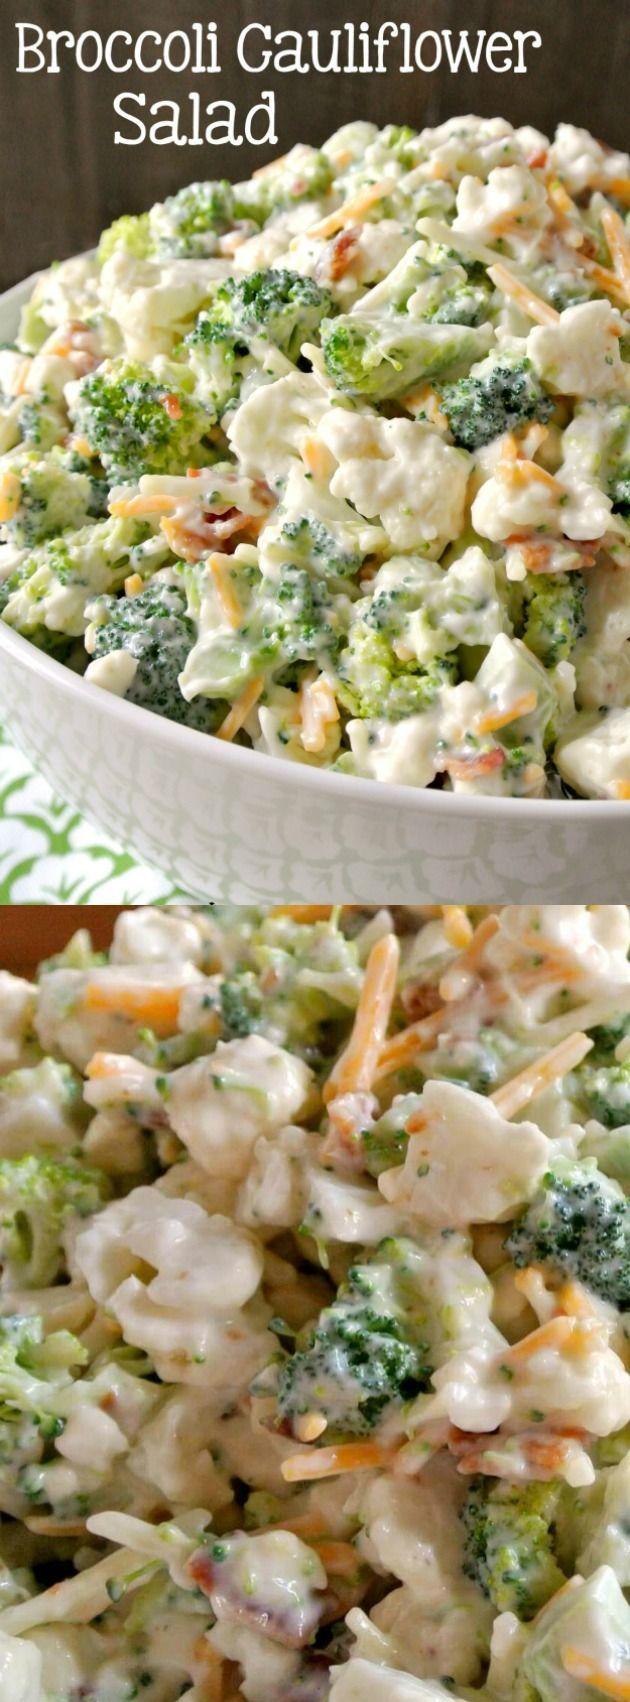 Deliciously Sweet Broccoli Cauliflower Salad